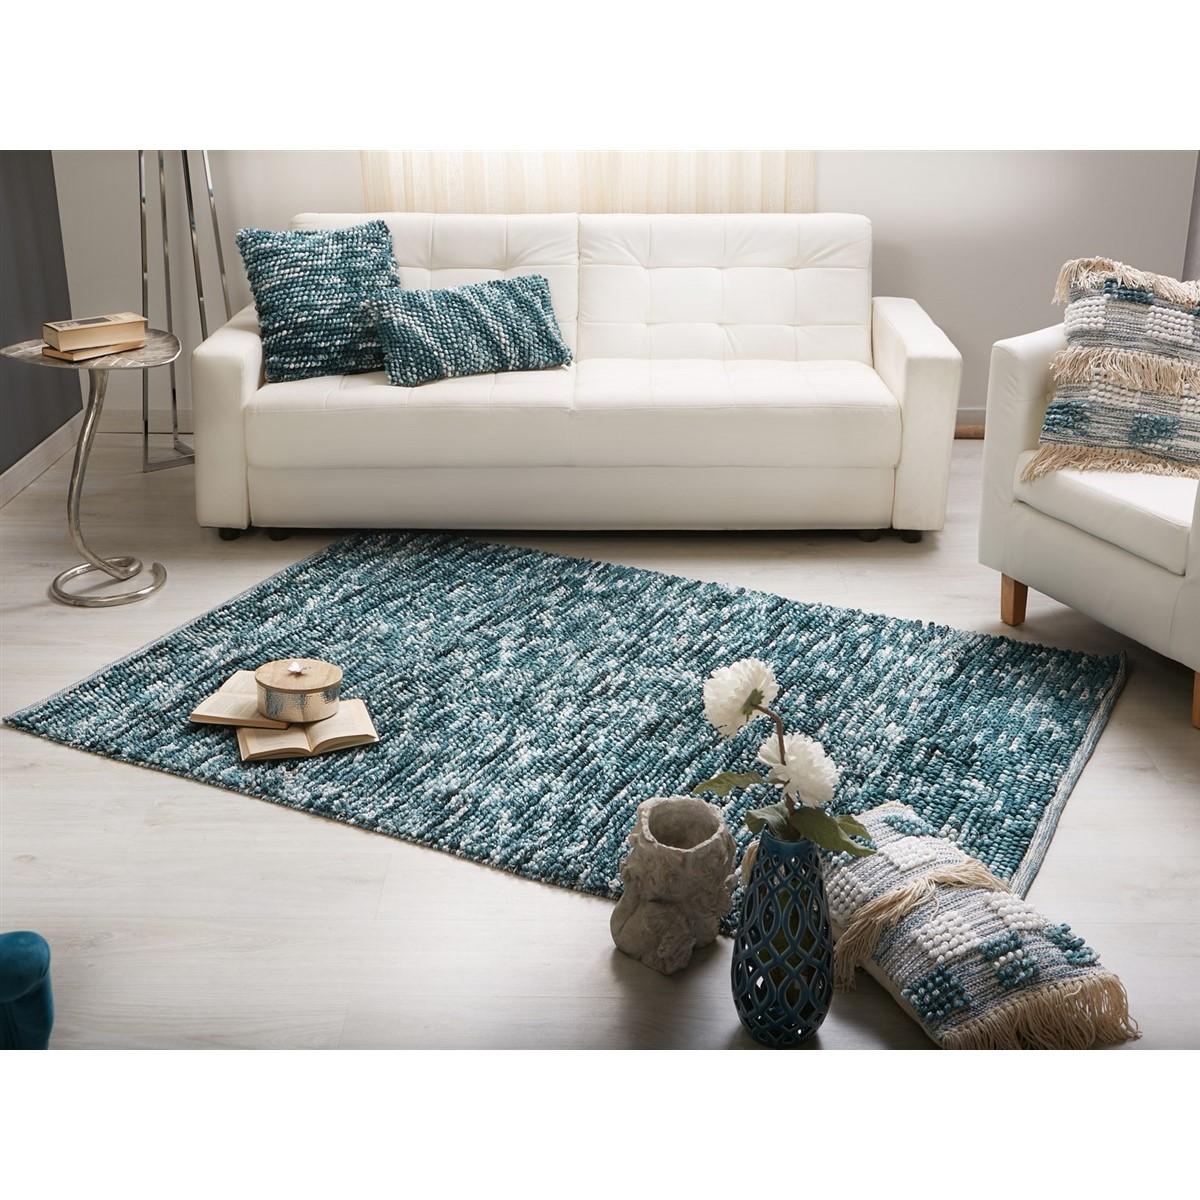 32478-alfombra-crochet-azul-130-x-190-cm.jpeg